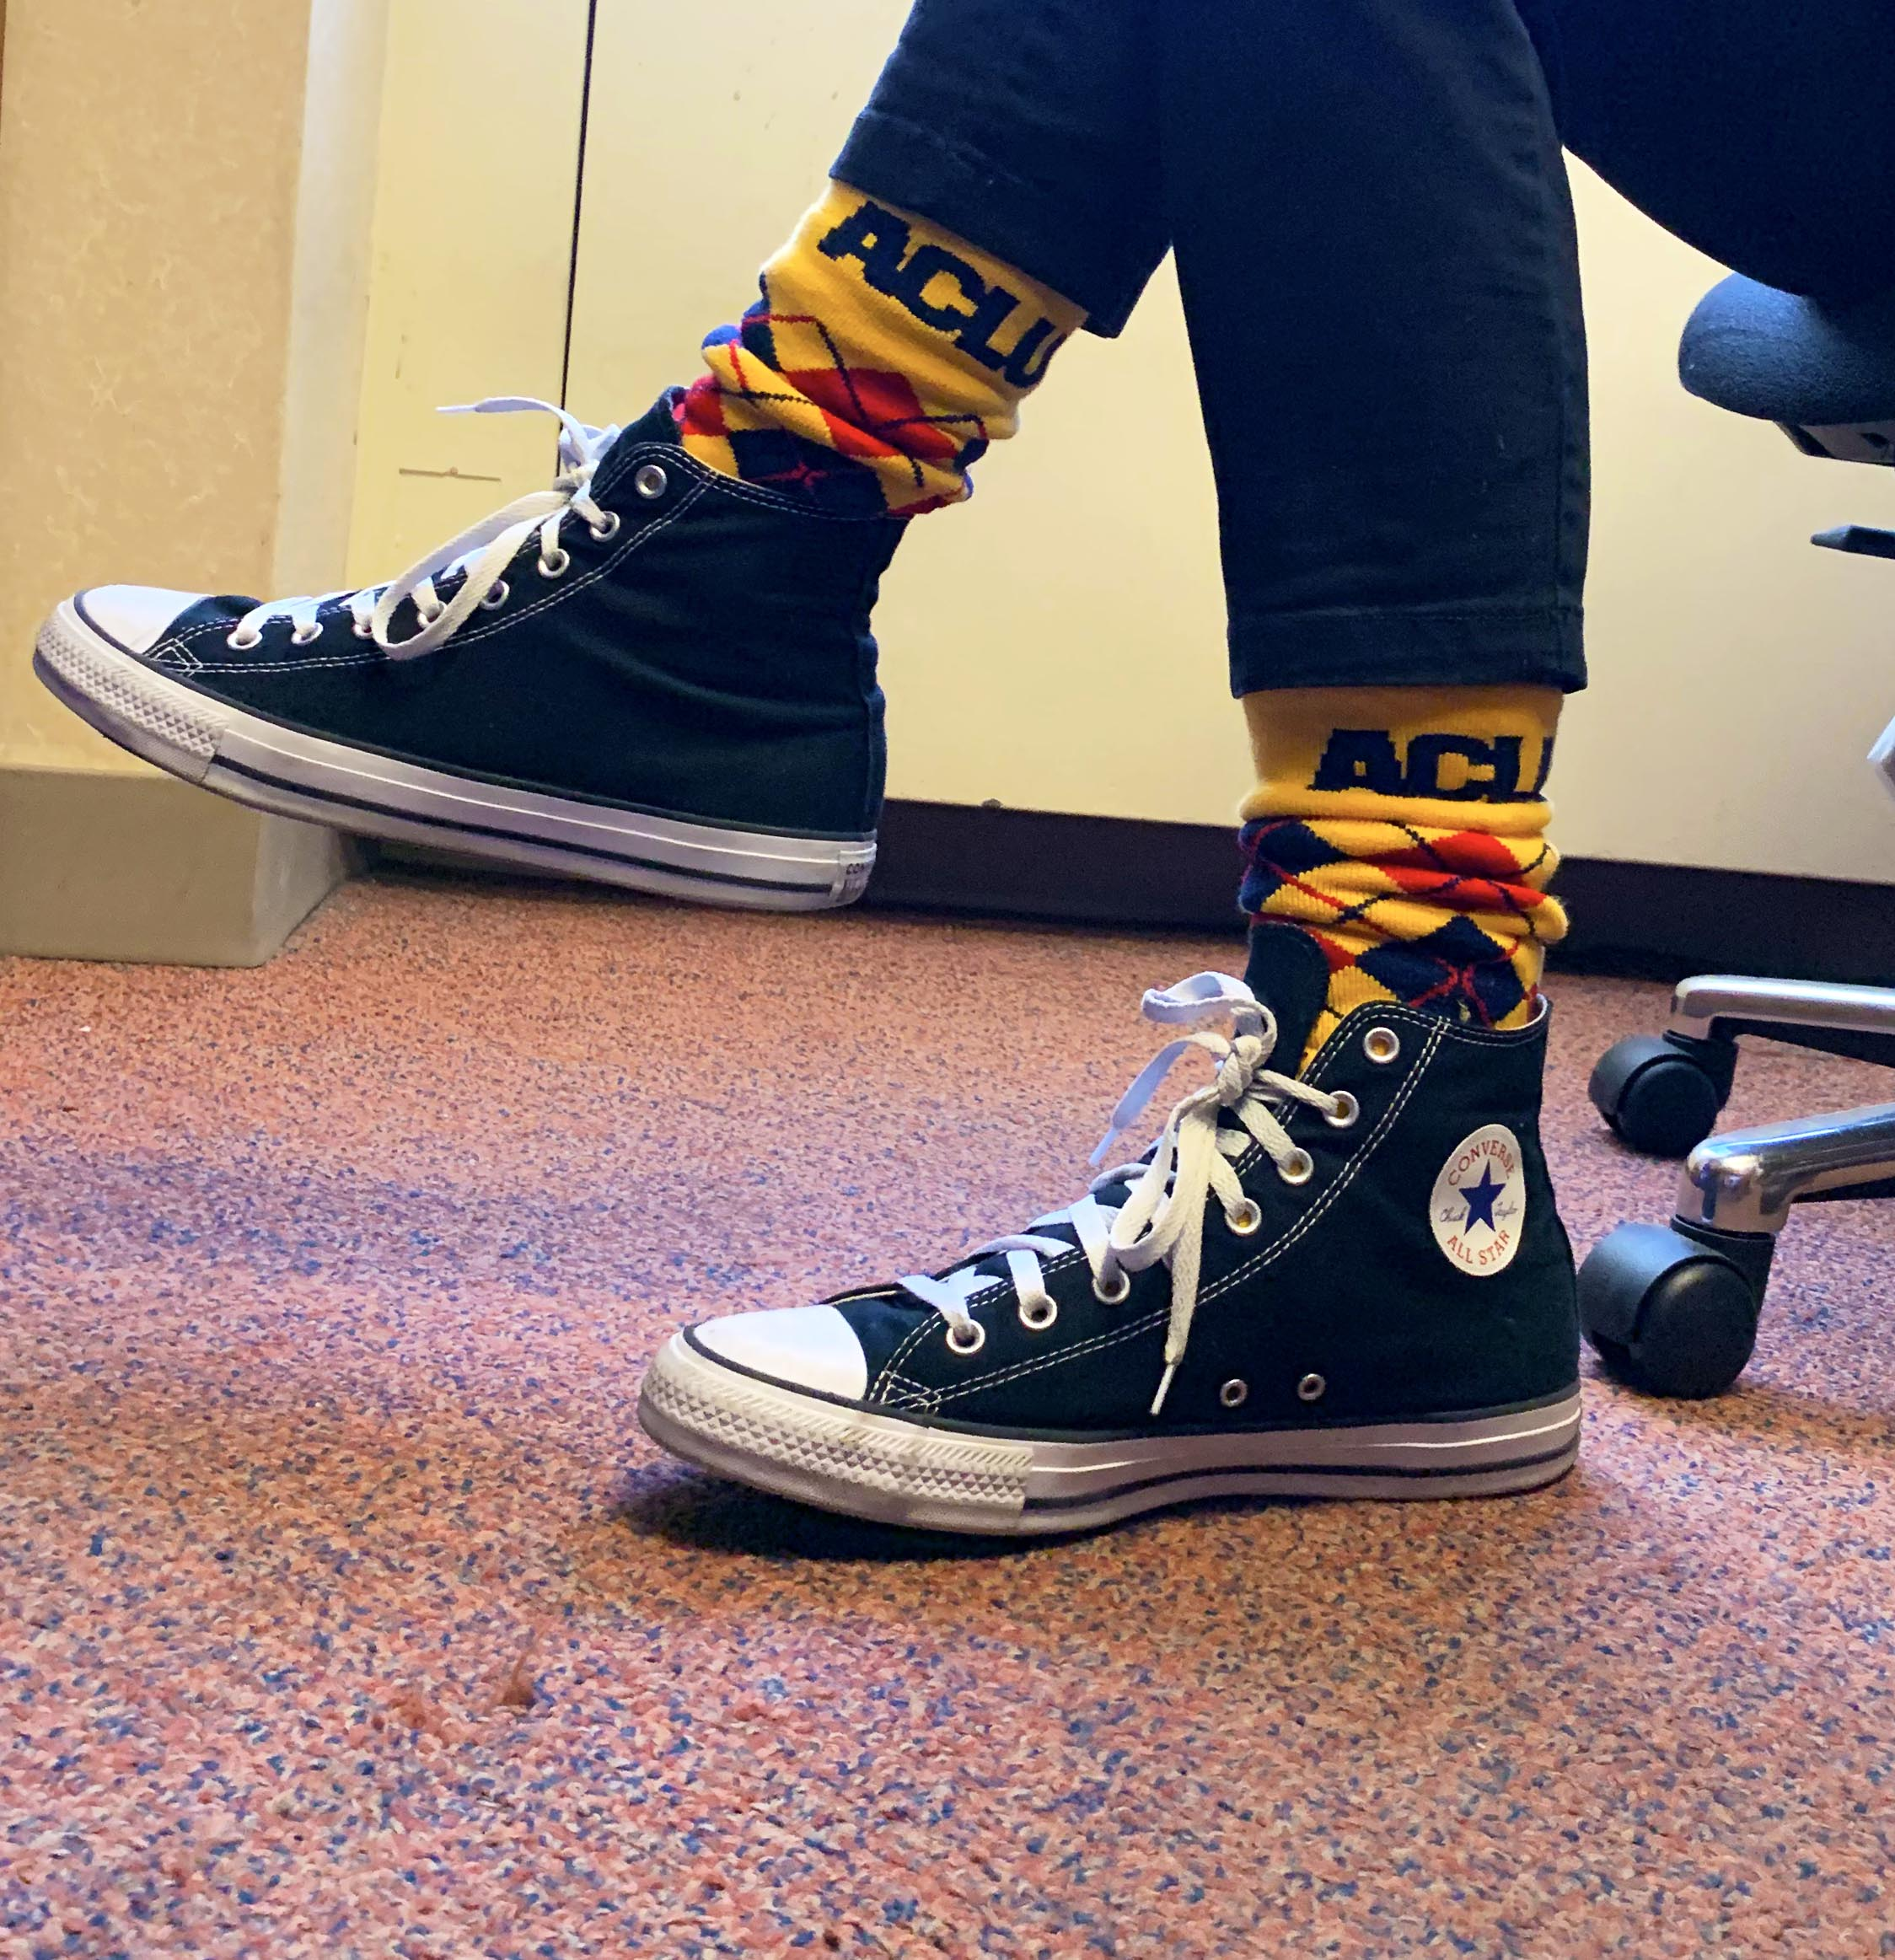 Yellow argyle socks on at office